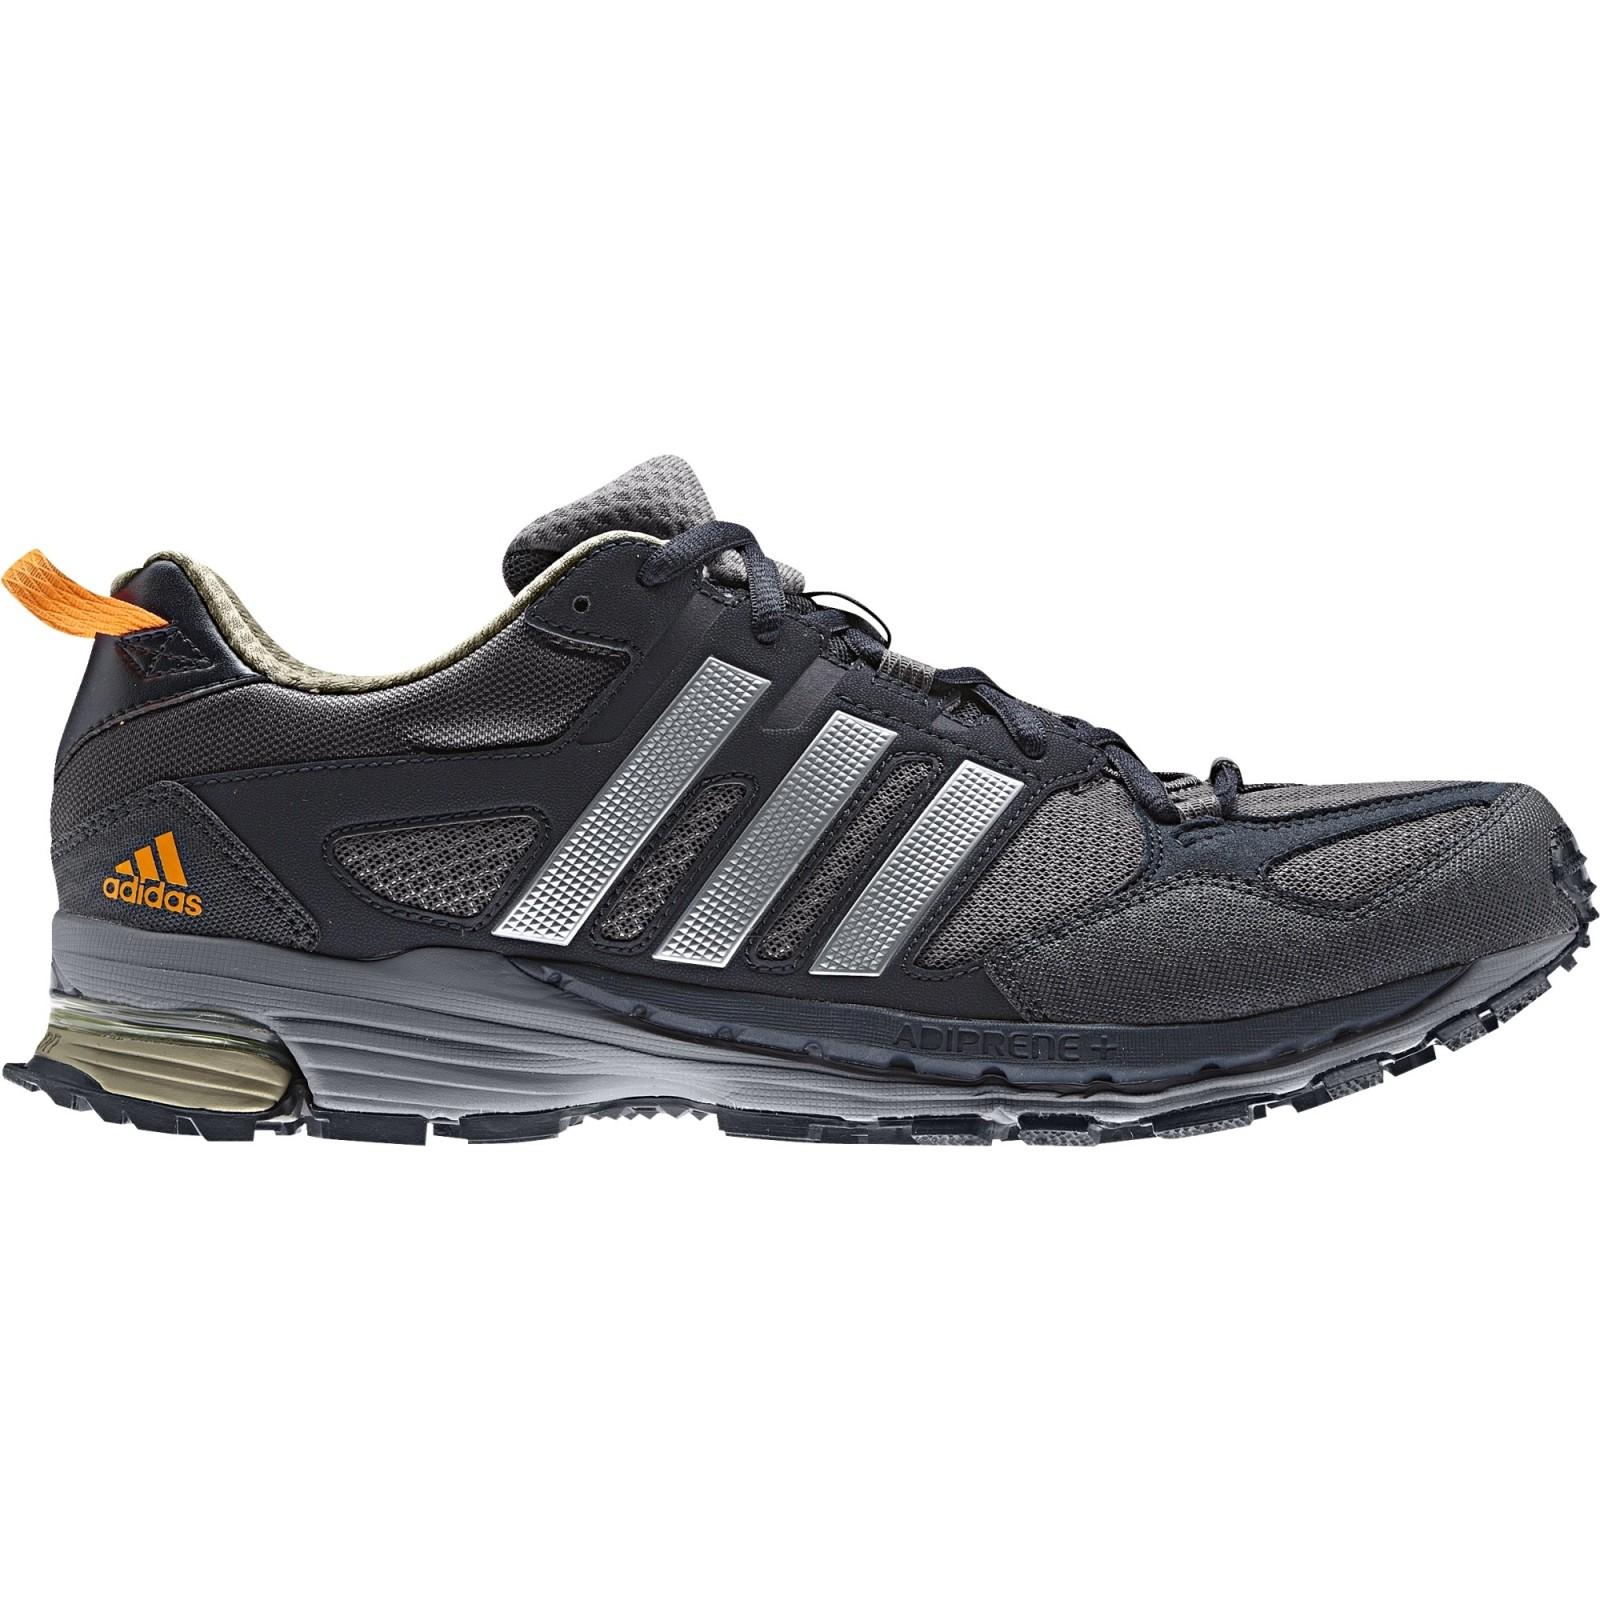 6096efd5e86 Pánské běžecké boty adidas supernova riot 5 m